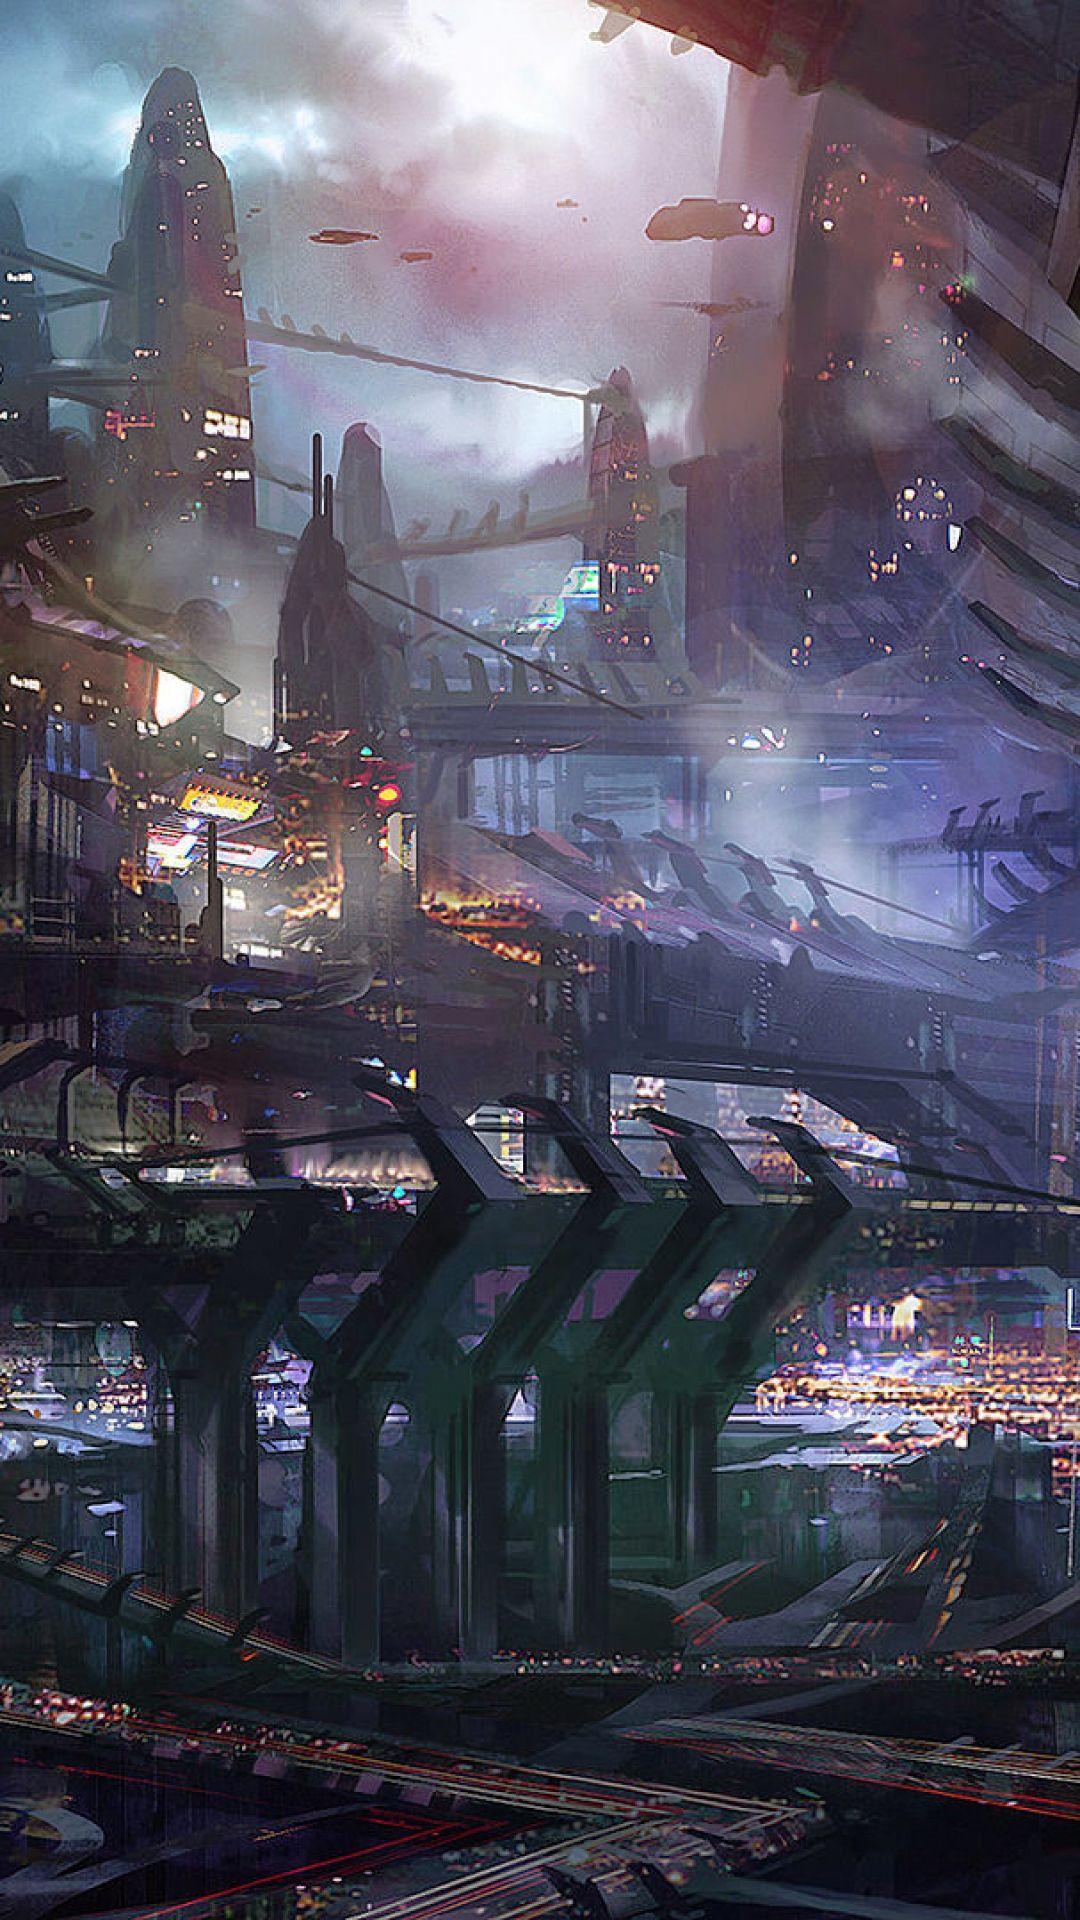 ☺iphone ios 7 wallpaper tumblr for ipad Sci Fi Cities